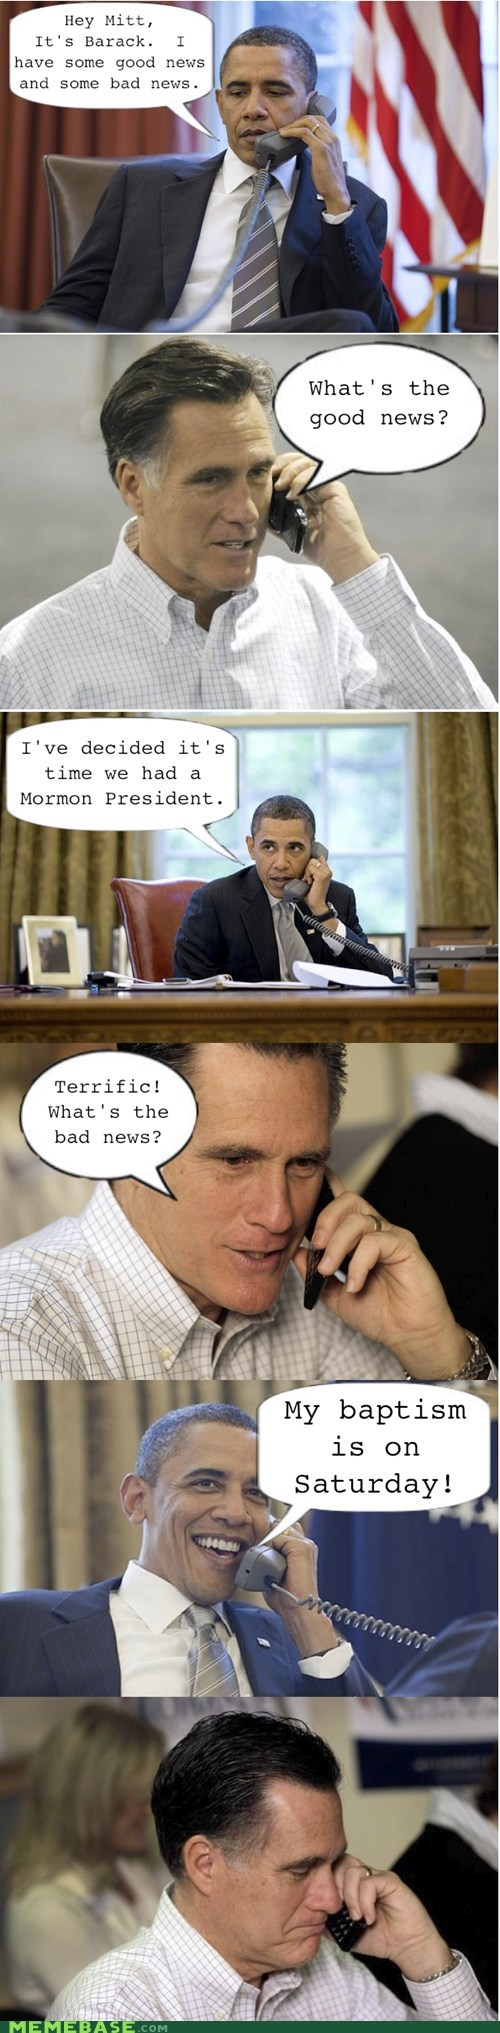 2012 Presidential Campaig,barack obama,mormon,politics,president